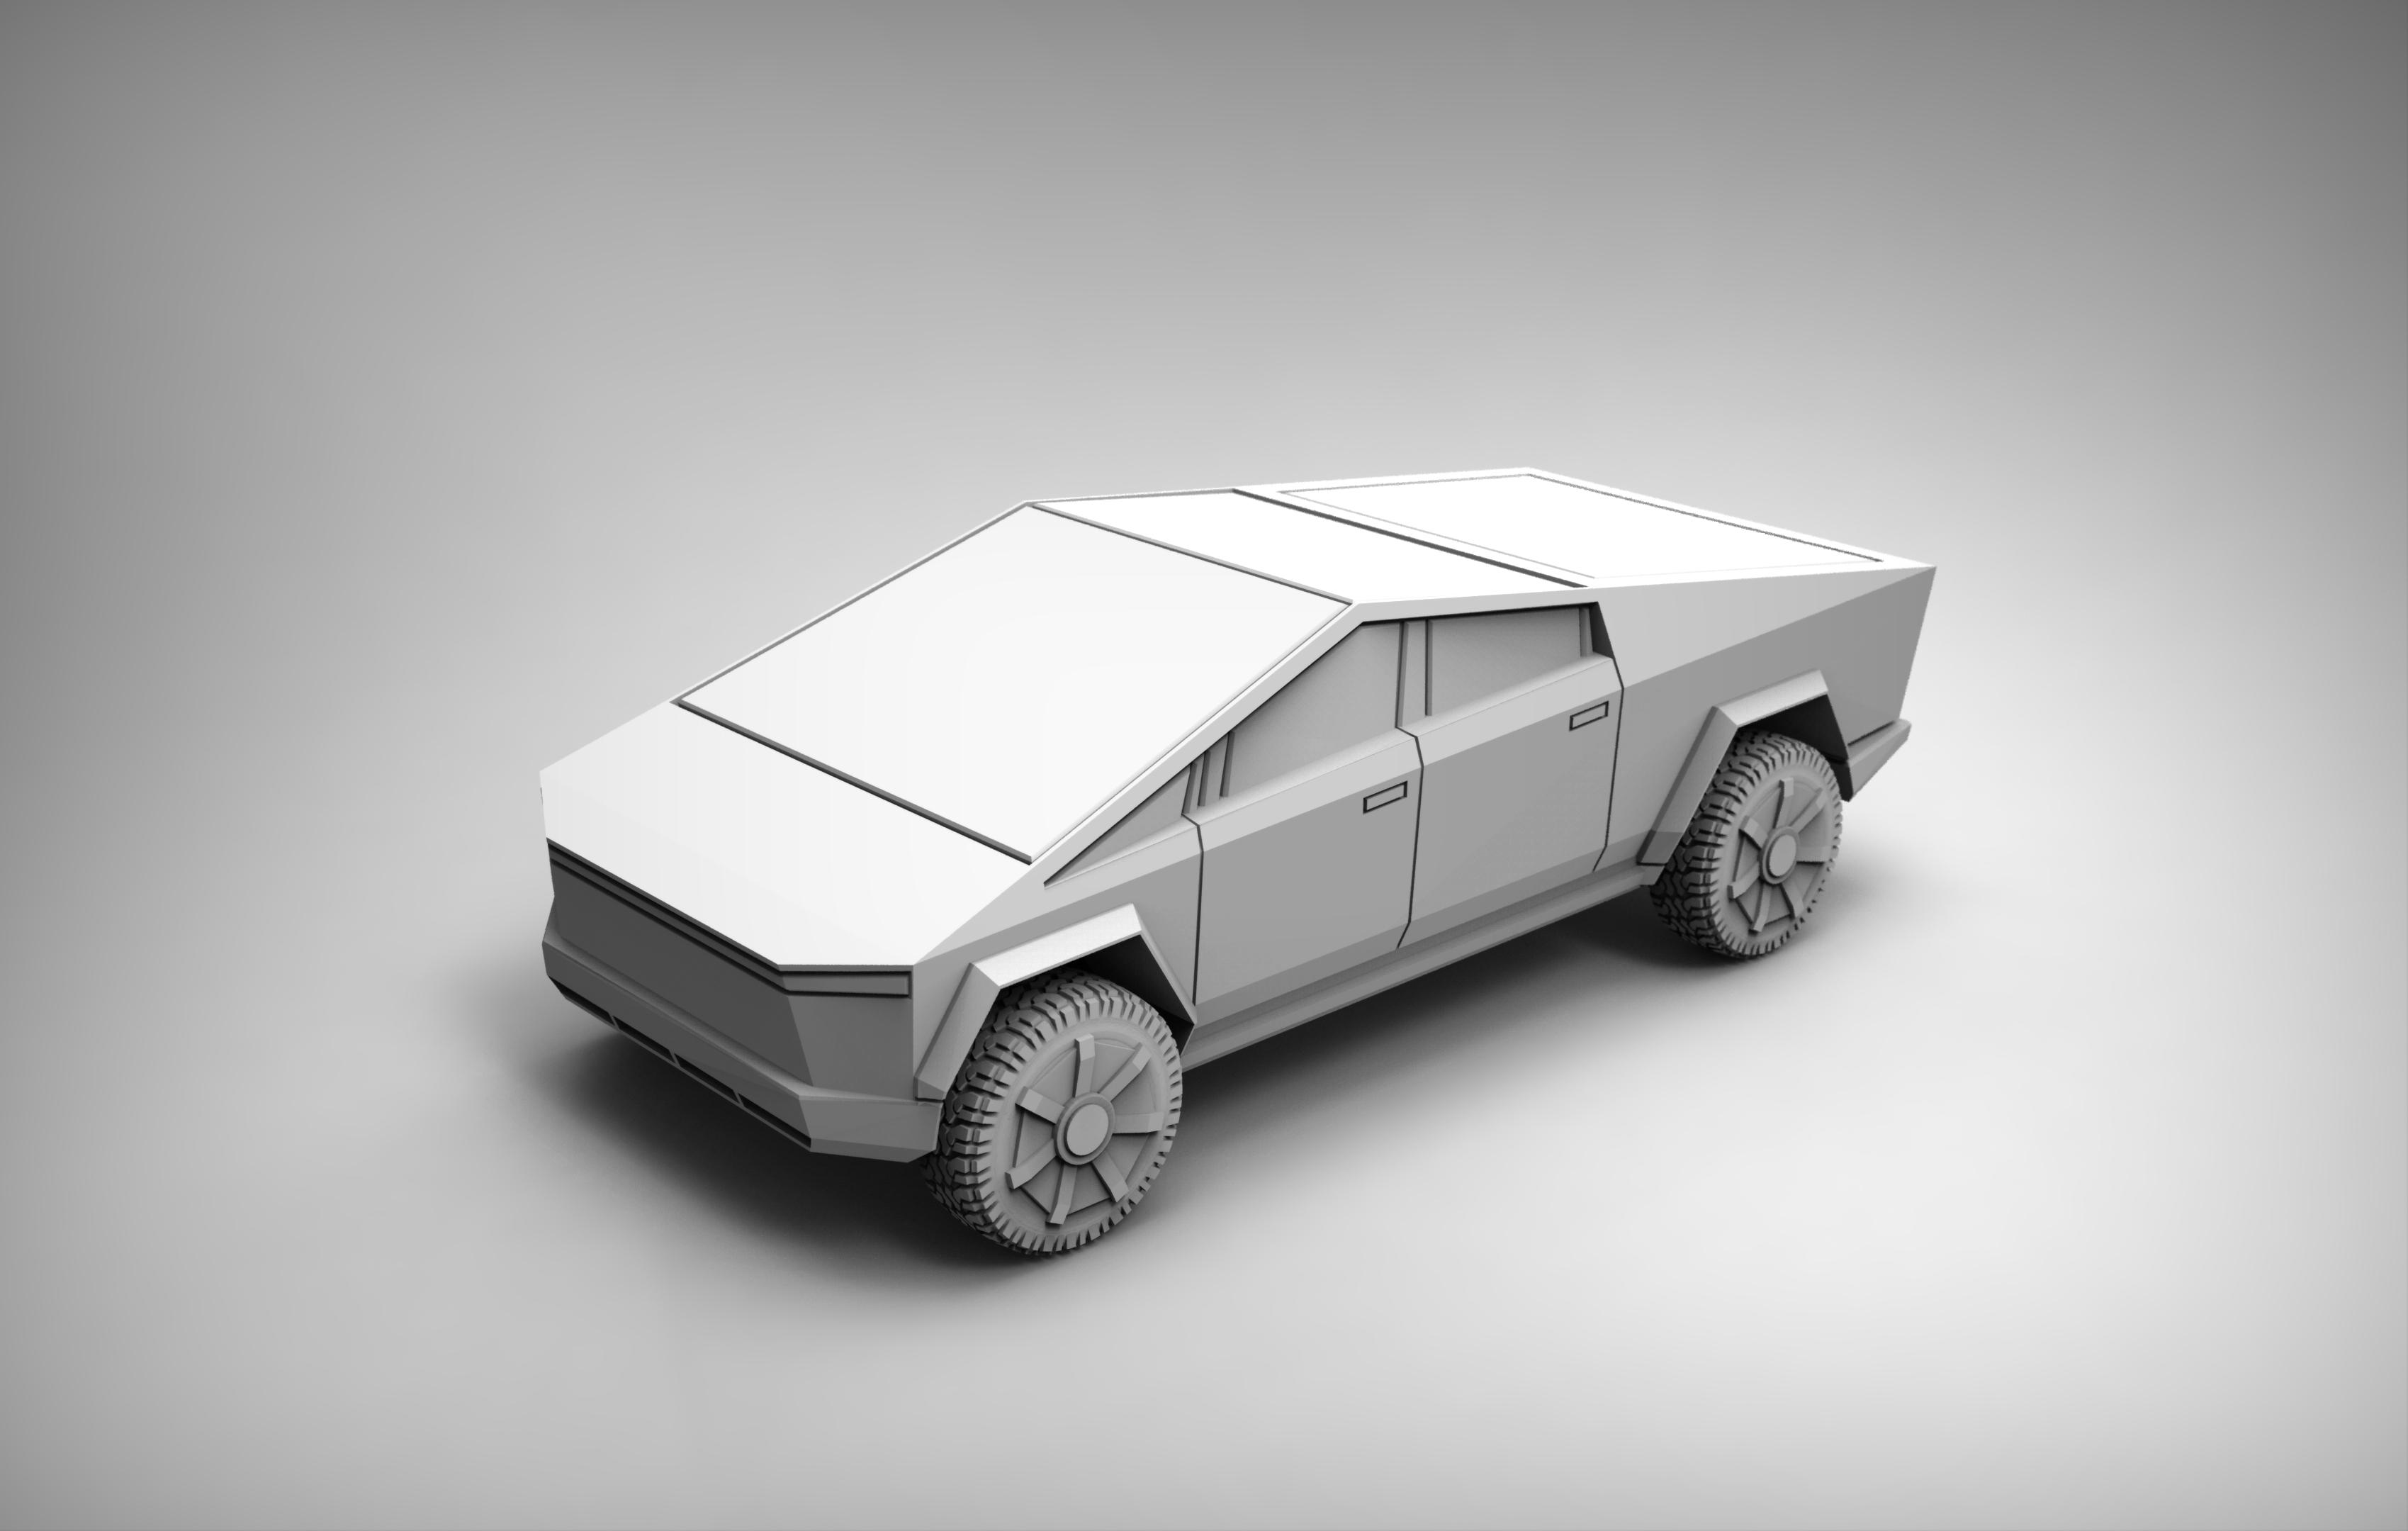 untitled.1092.jpg Download free STL file Tesla Cybertruck 28mm • 3D printing design, BREXIT